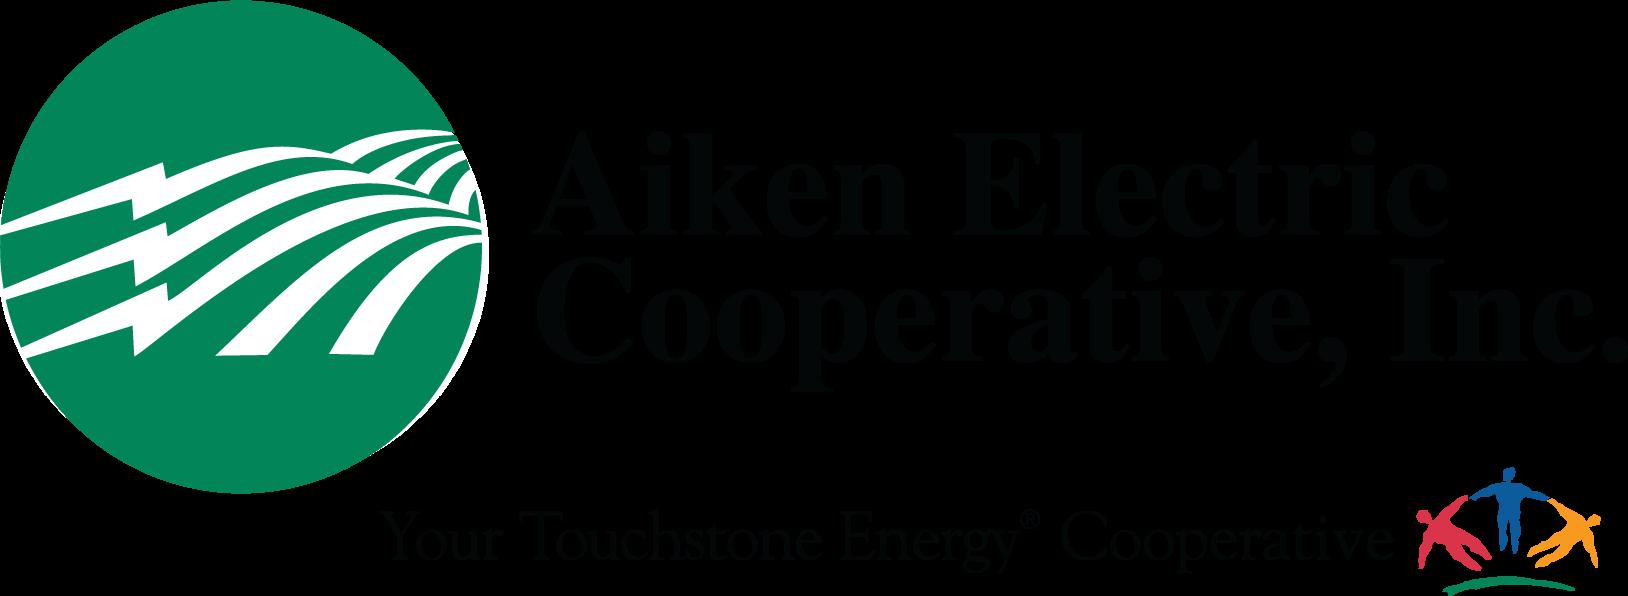 Aiken Electric Cooperative logo